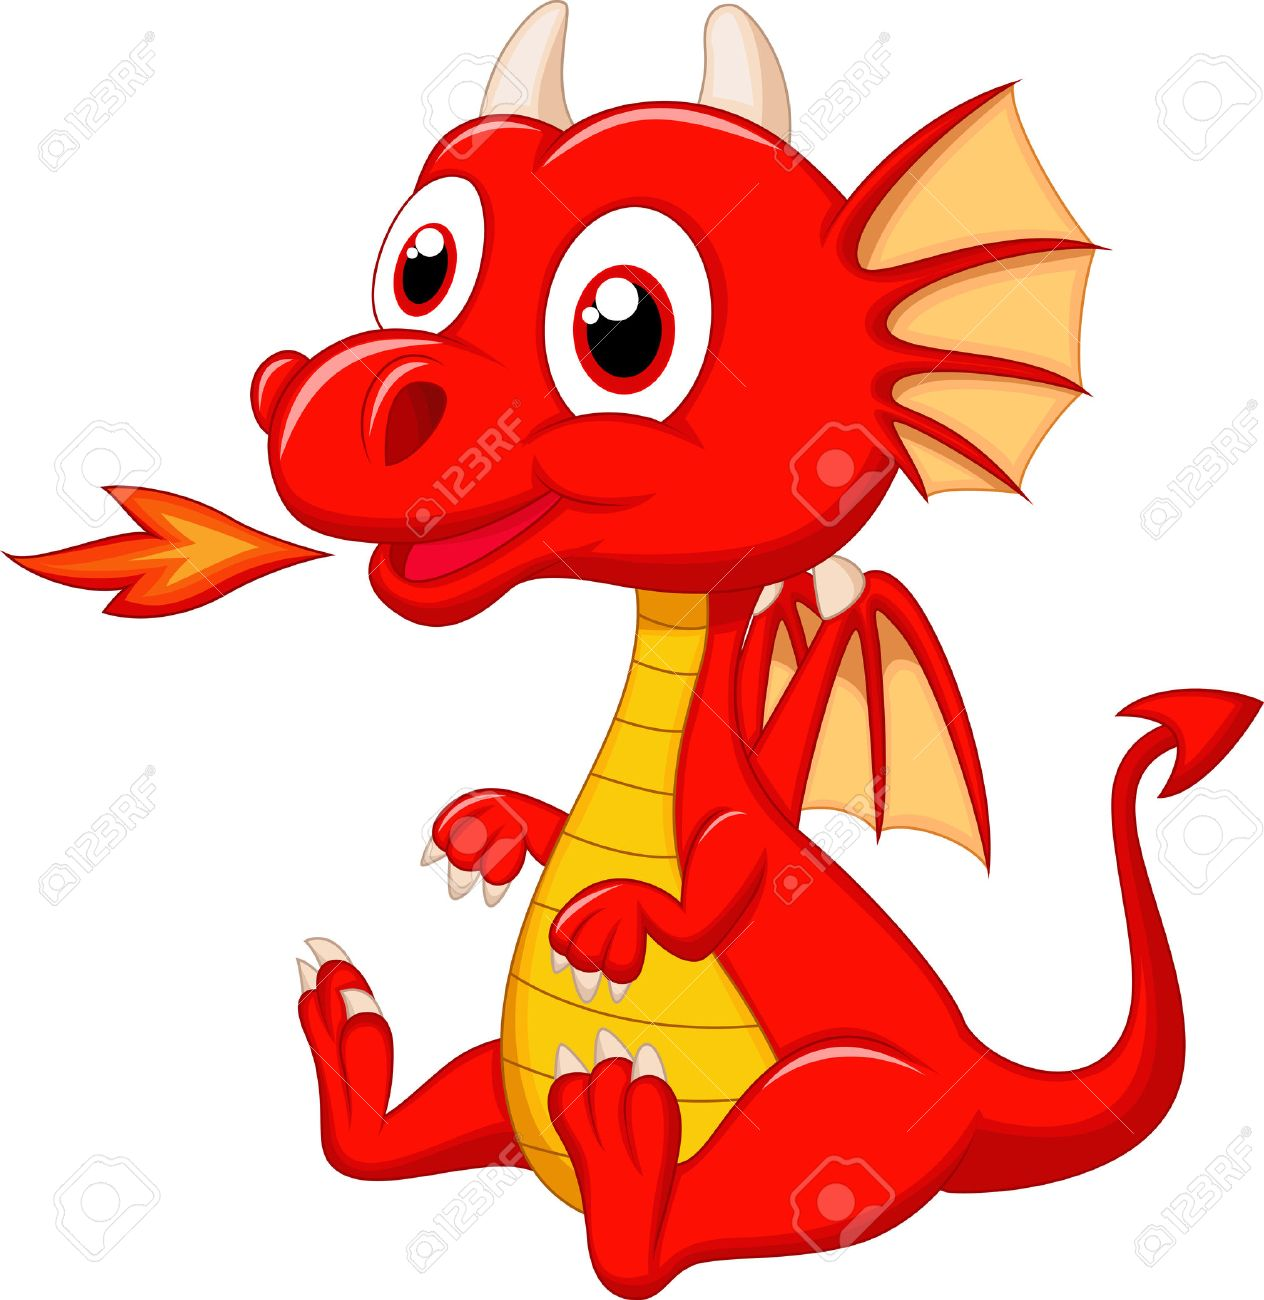 Cute Baby Dragon Cartoon Royalty Free Cliparts Vectors And Stock Illustration Image 23462867